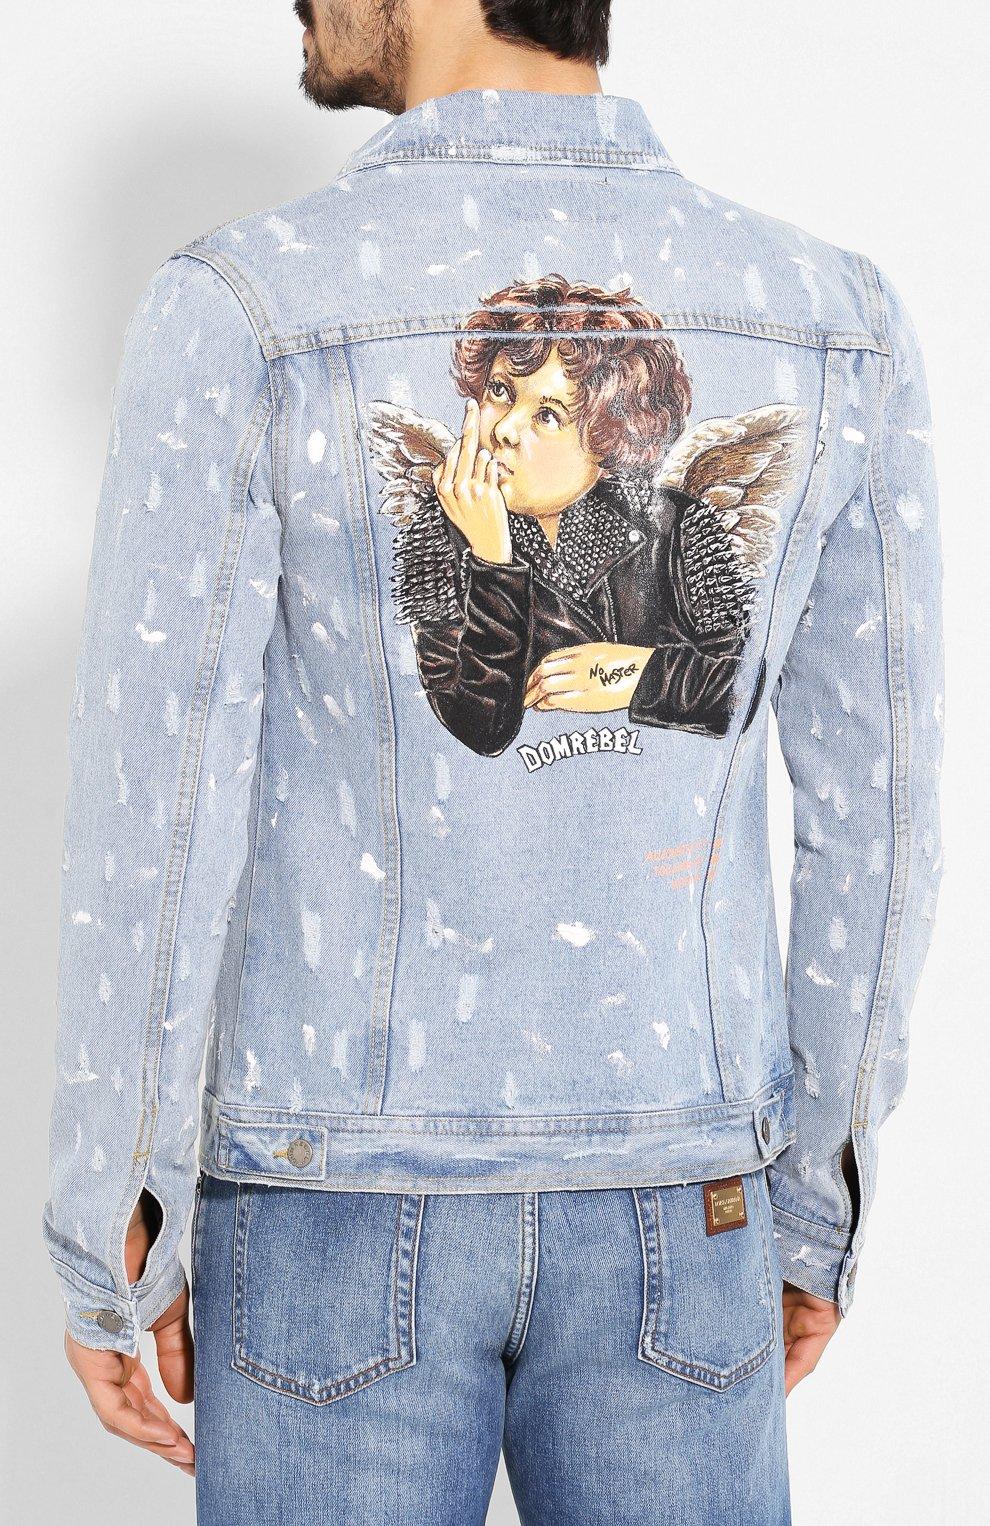 Мужская джинсовая куртка DOM REBEL голубого цвета, арт. REBEL/JEAN JACKET | Фото 4